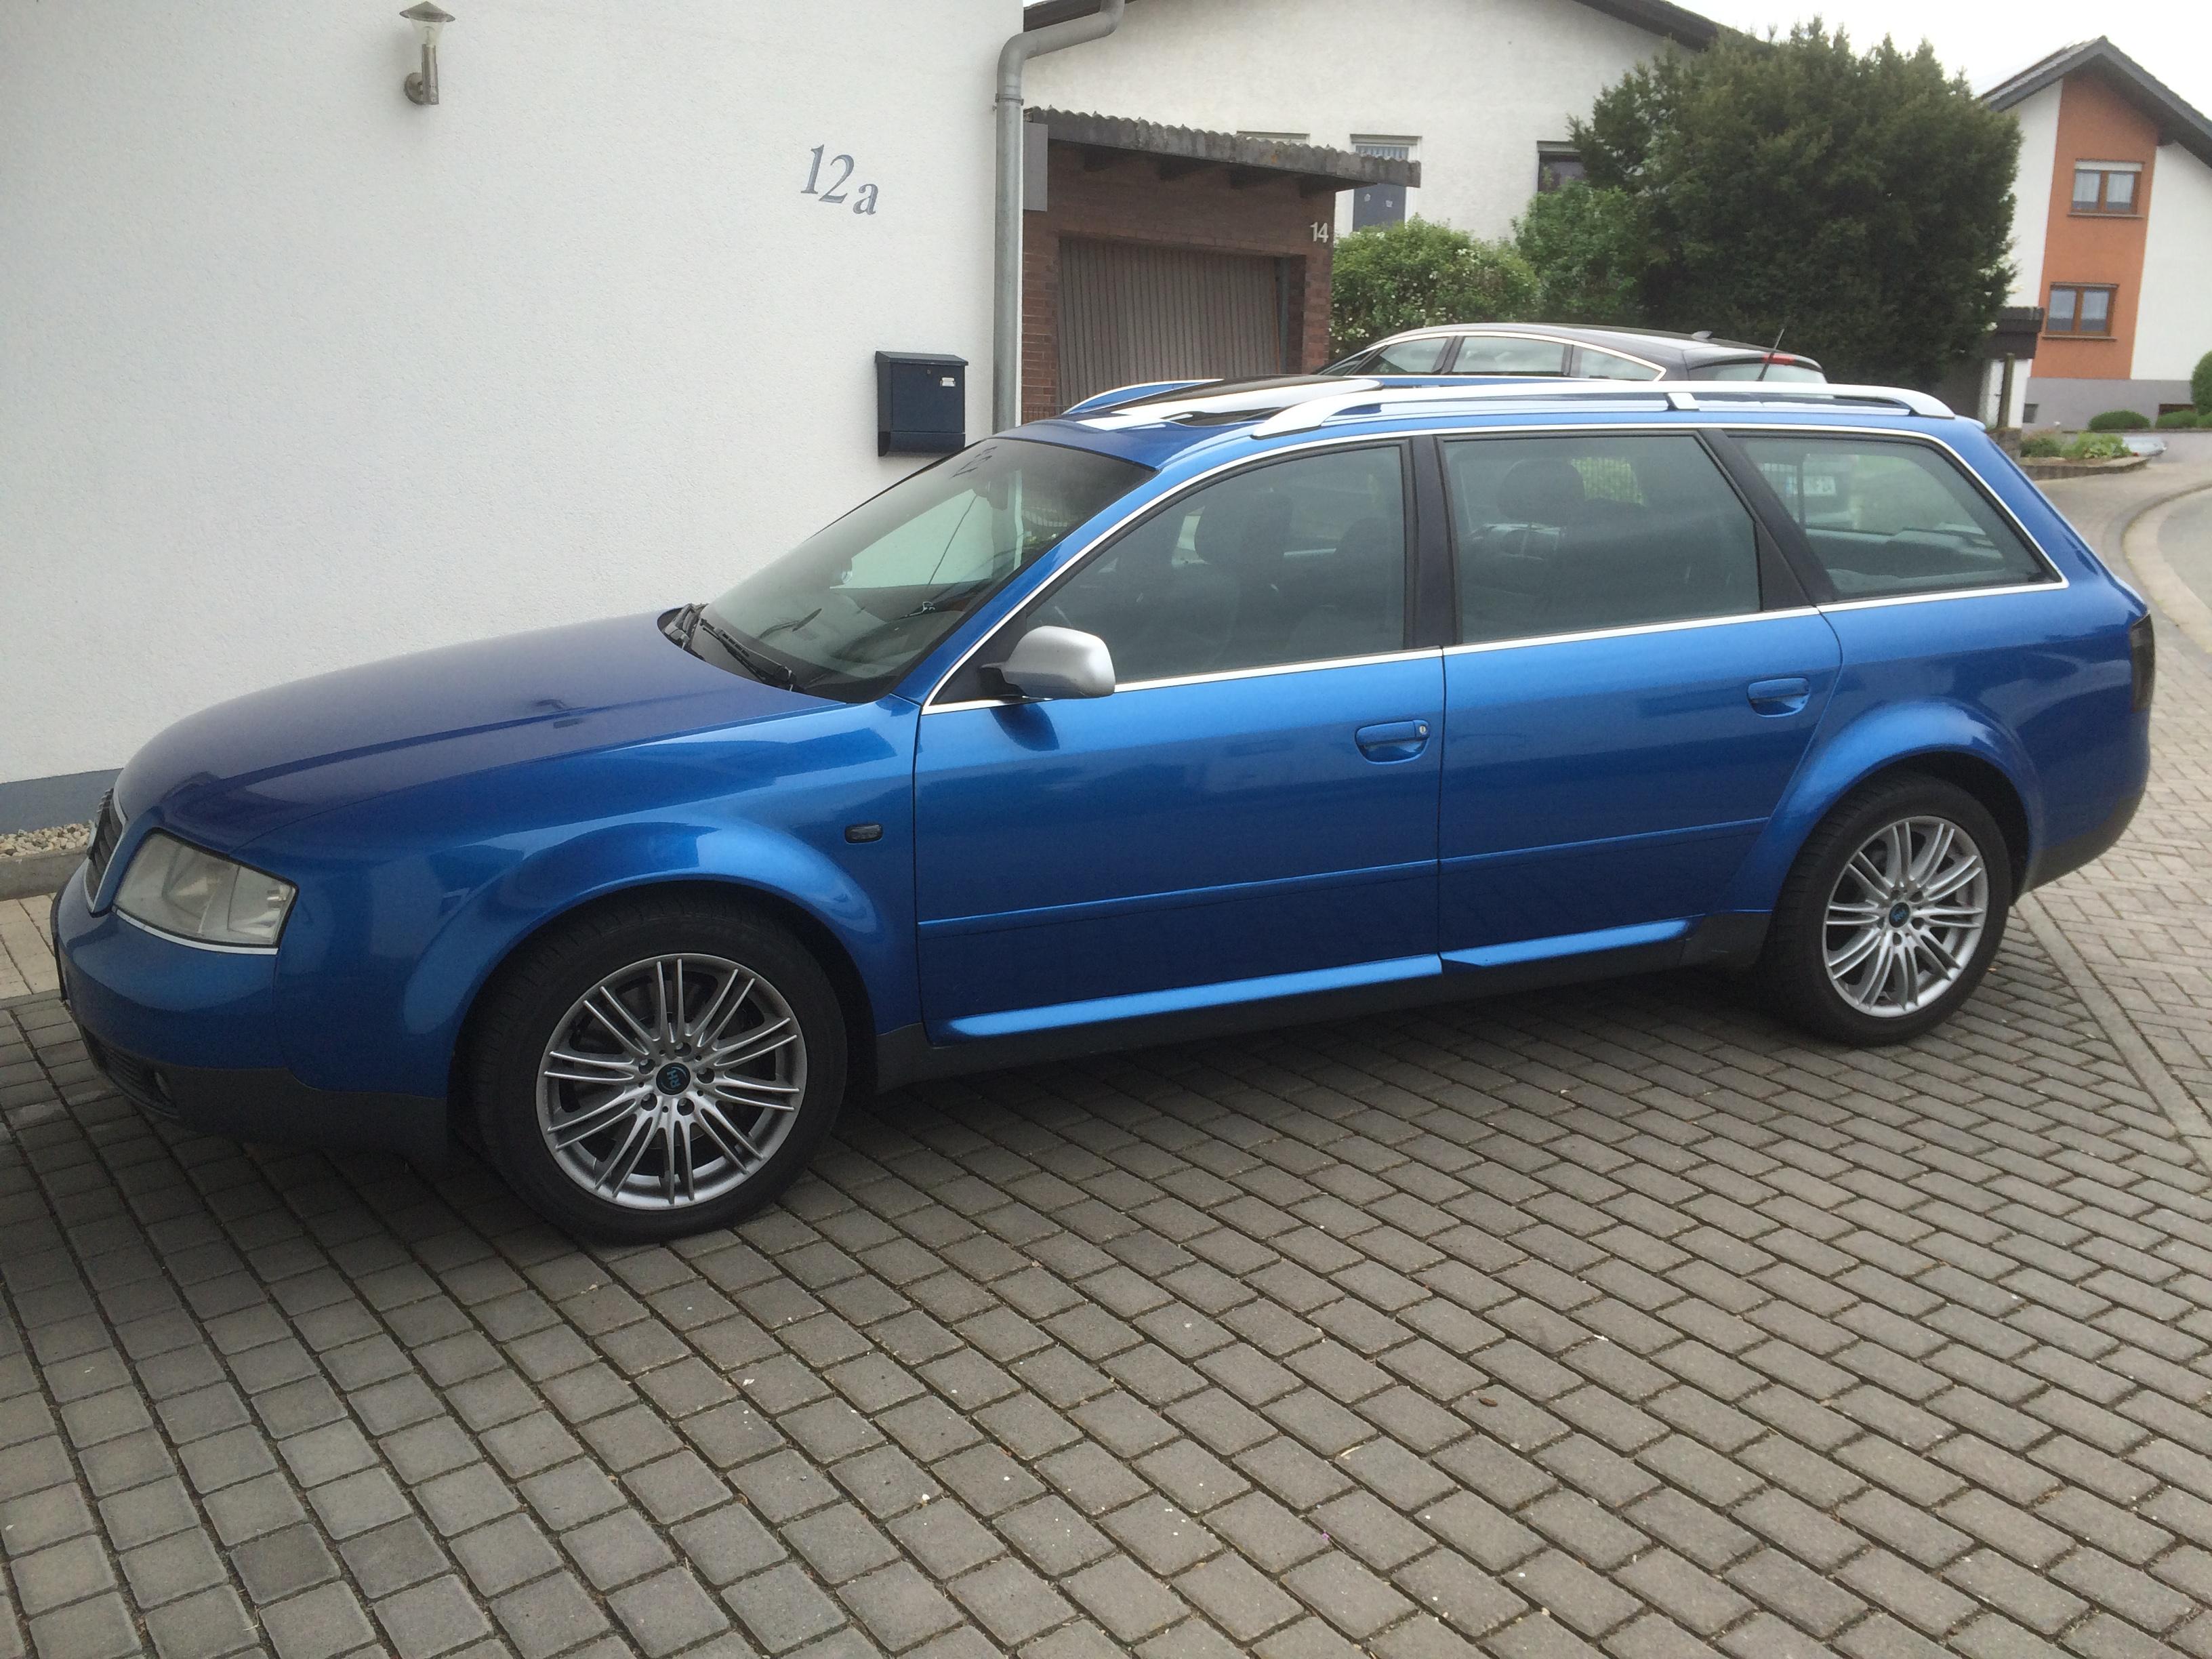 Fahrzeugbeispiel Chiptuning Audi A4 (3)